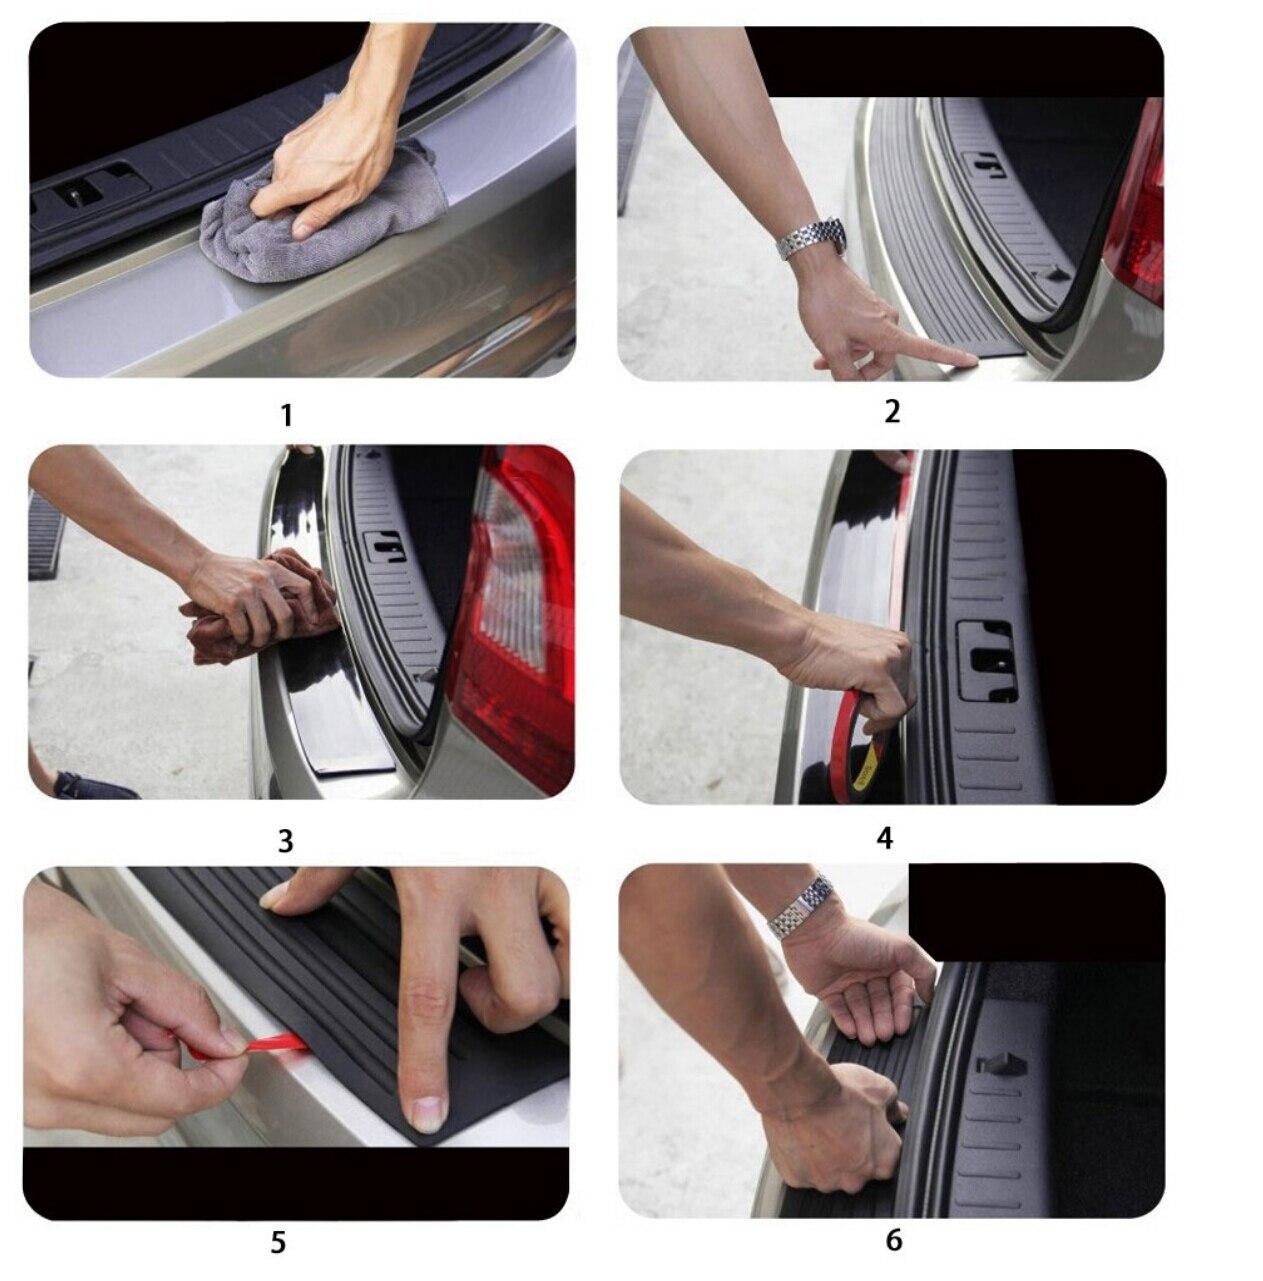 Image 3 - Car Styling Rear Bumper Scuff Cover Sticker For Mazda 3 5 Atenza CX 4 CX 5 CX 7 CX 9 Seat Toledo 4 Leon Ateca Arona Accessories-in Car Tax Disc Holders from Automobiles & Motorcycles